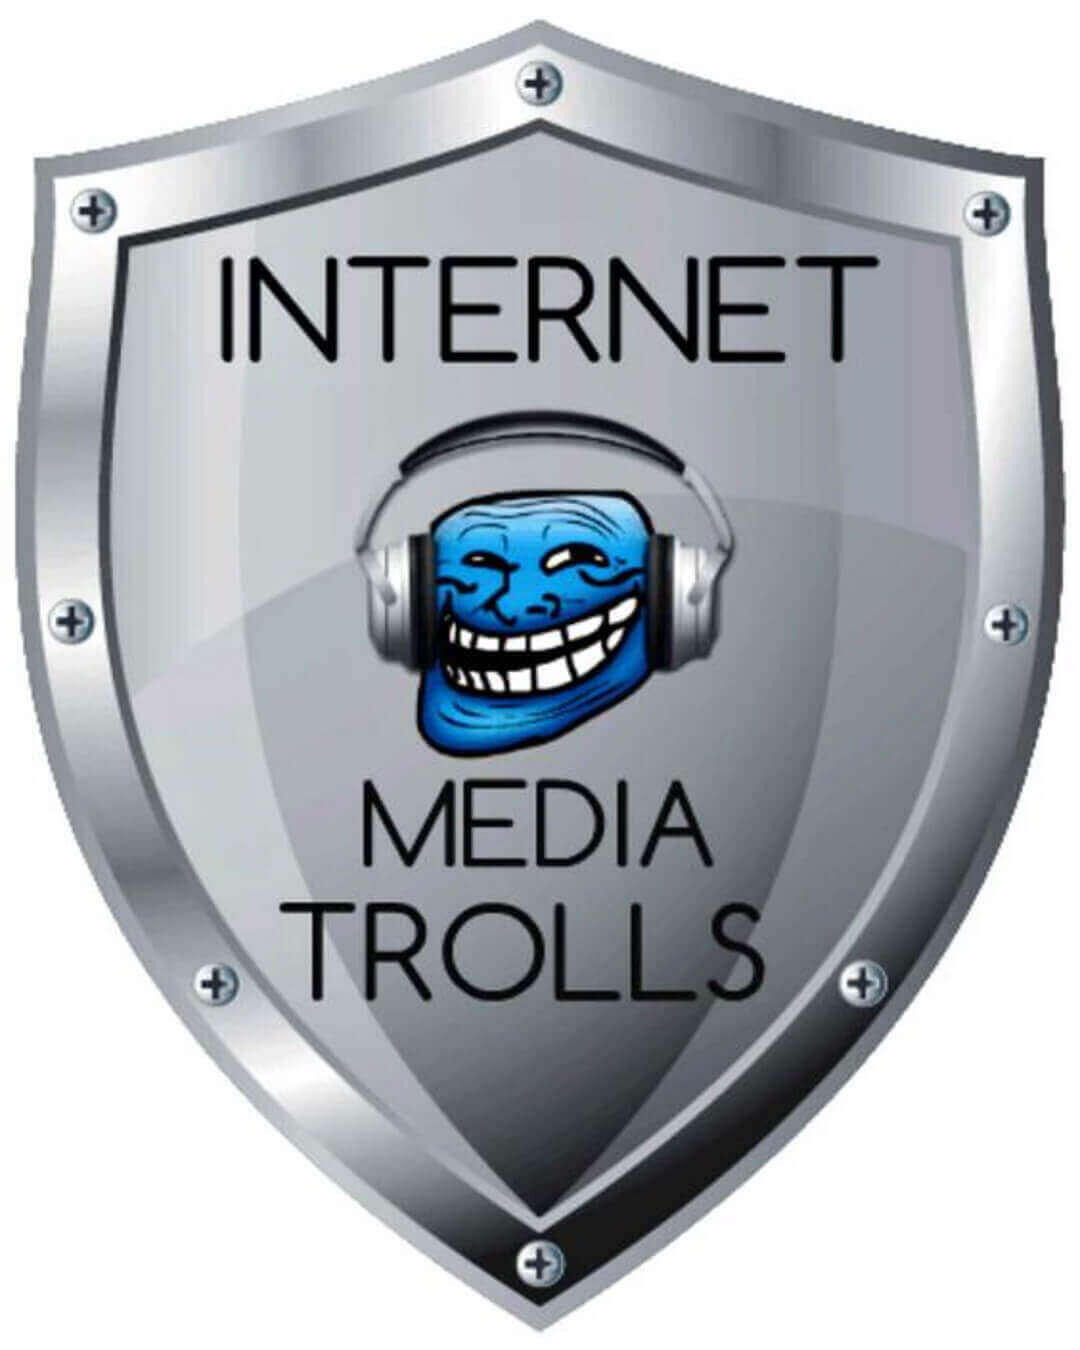 michael-nuccitelli-troll-triad-image (50)